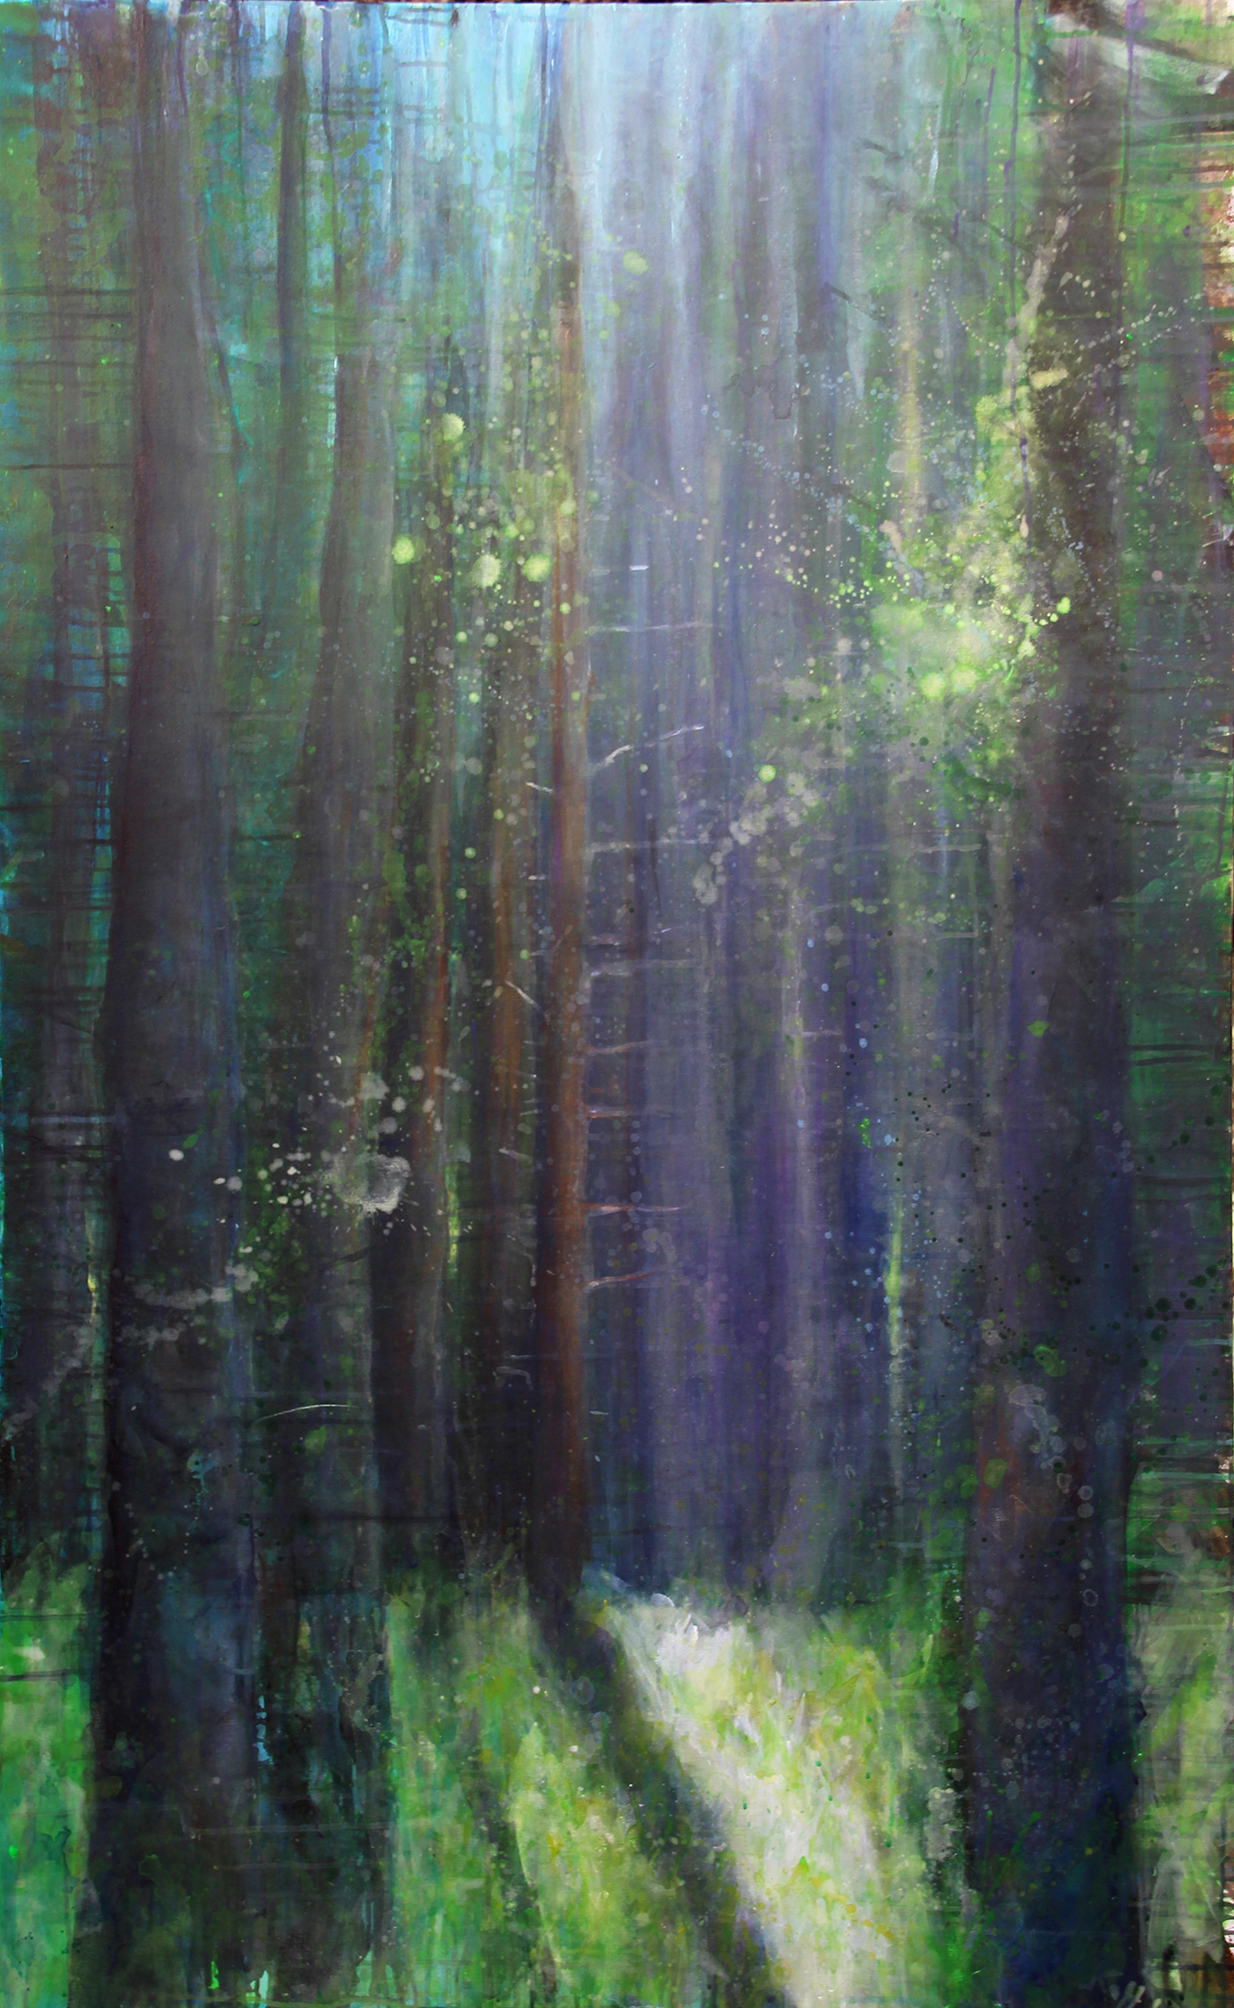 breathing green: secret place, Acryl auf Leinwand, 160 x 100 cm, 2017